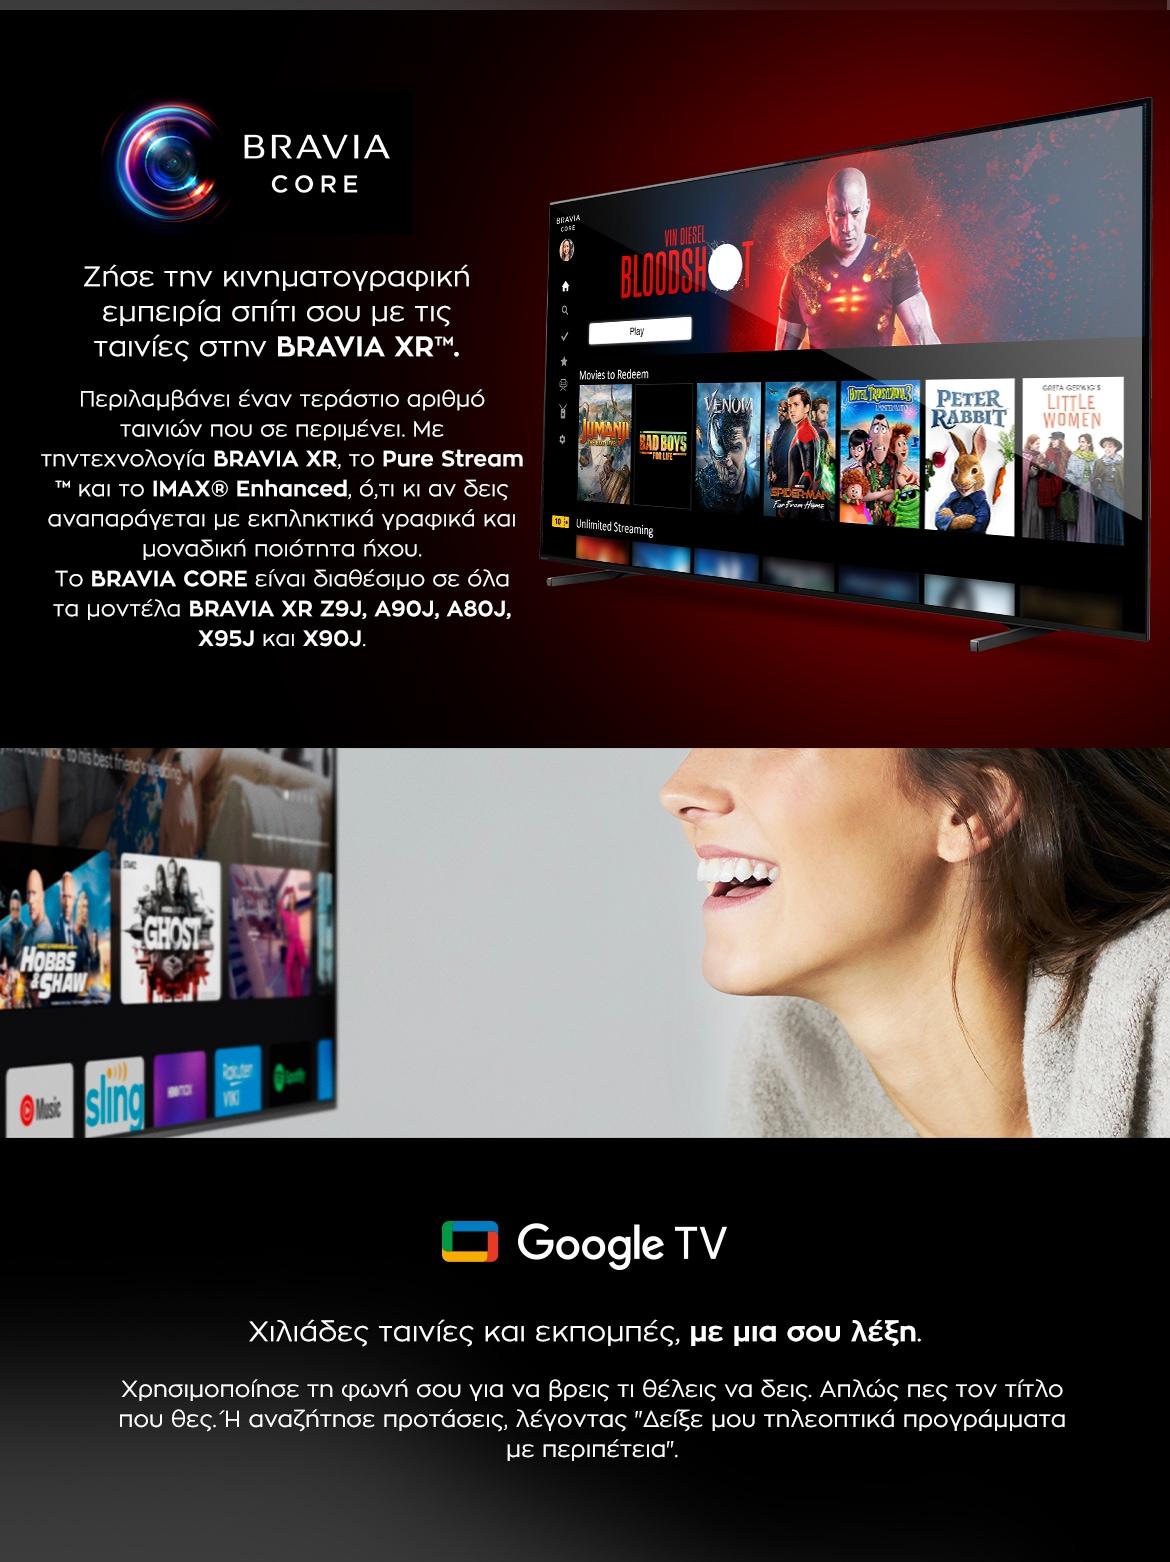 SONY Bravia XR OLED - Bravia Core & Google TV